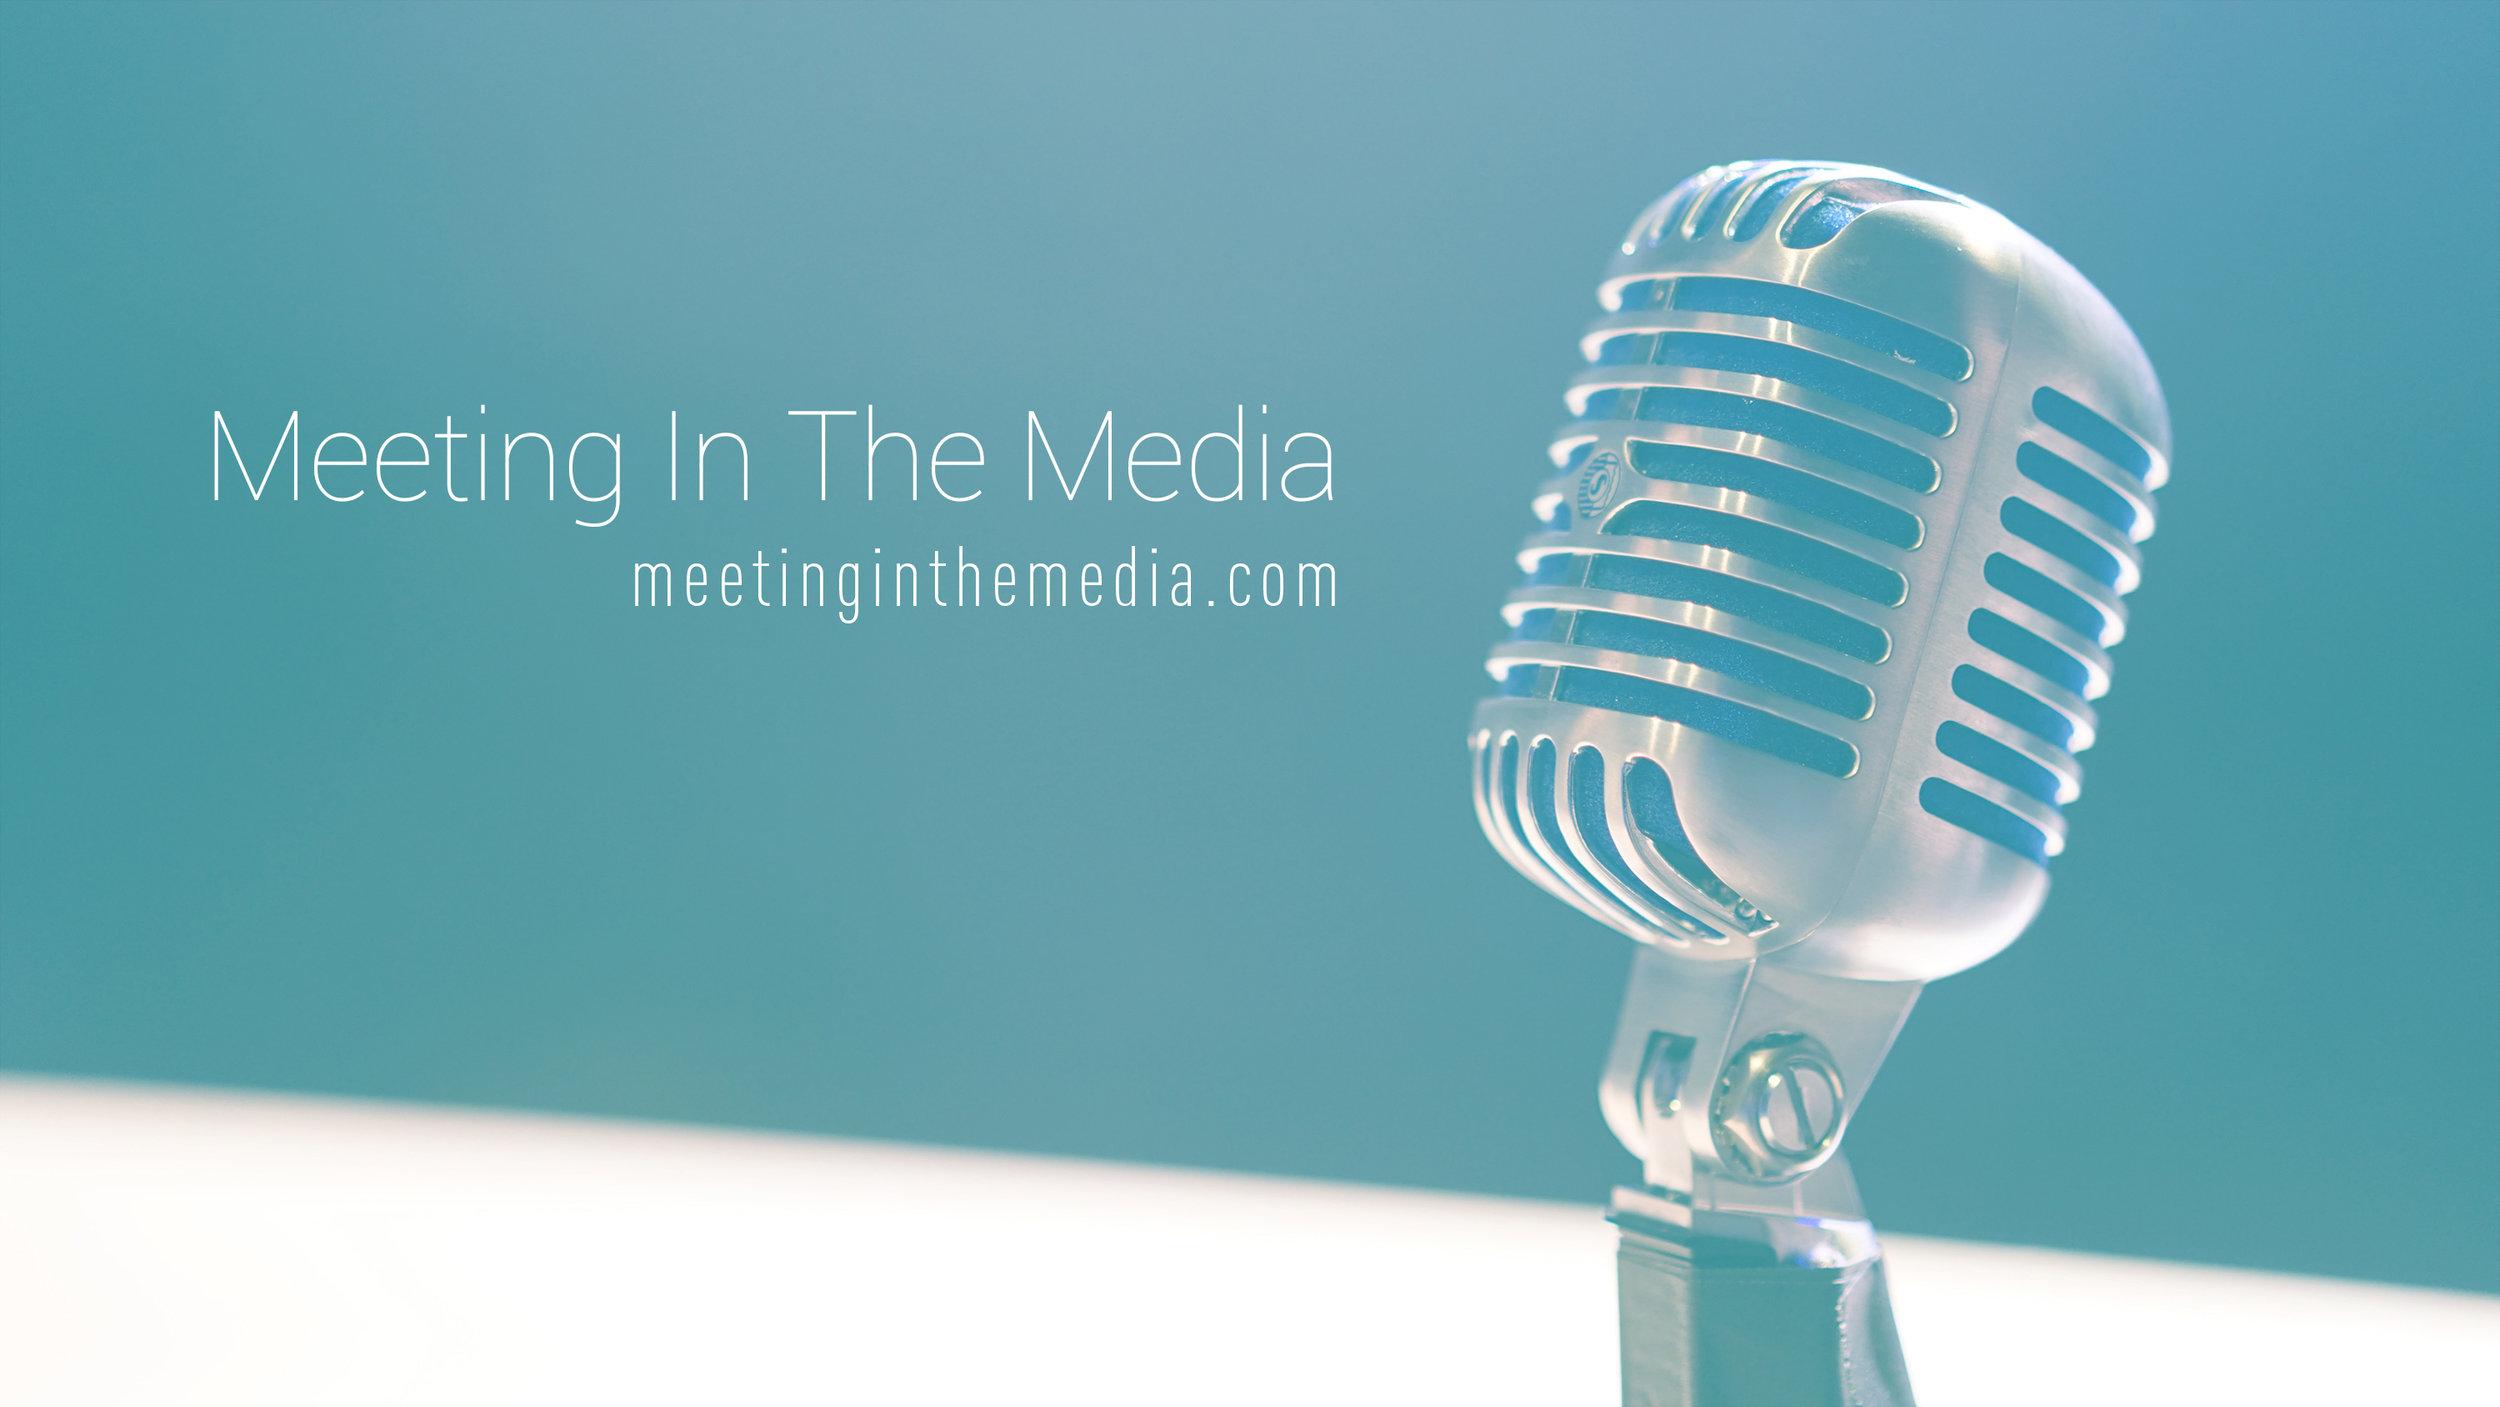 Meeting in the Media (@meetinginthemedia) branding multimedia work by Geena Matuson (@geenamatuson).